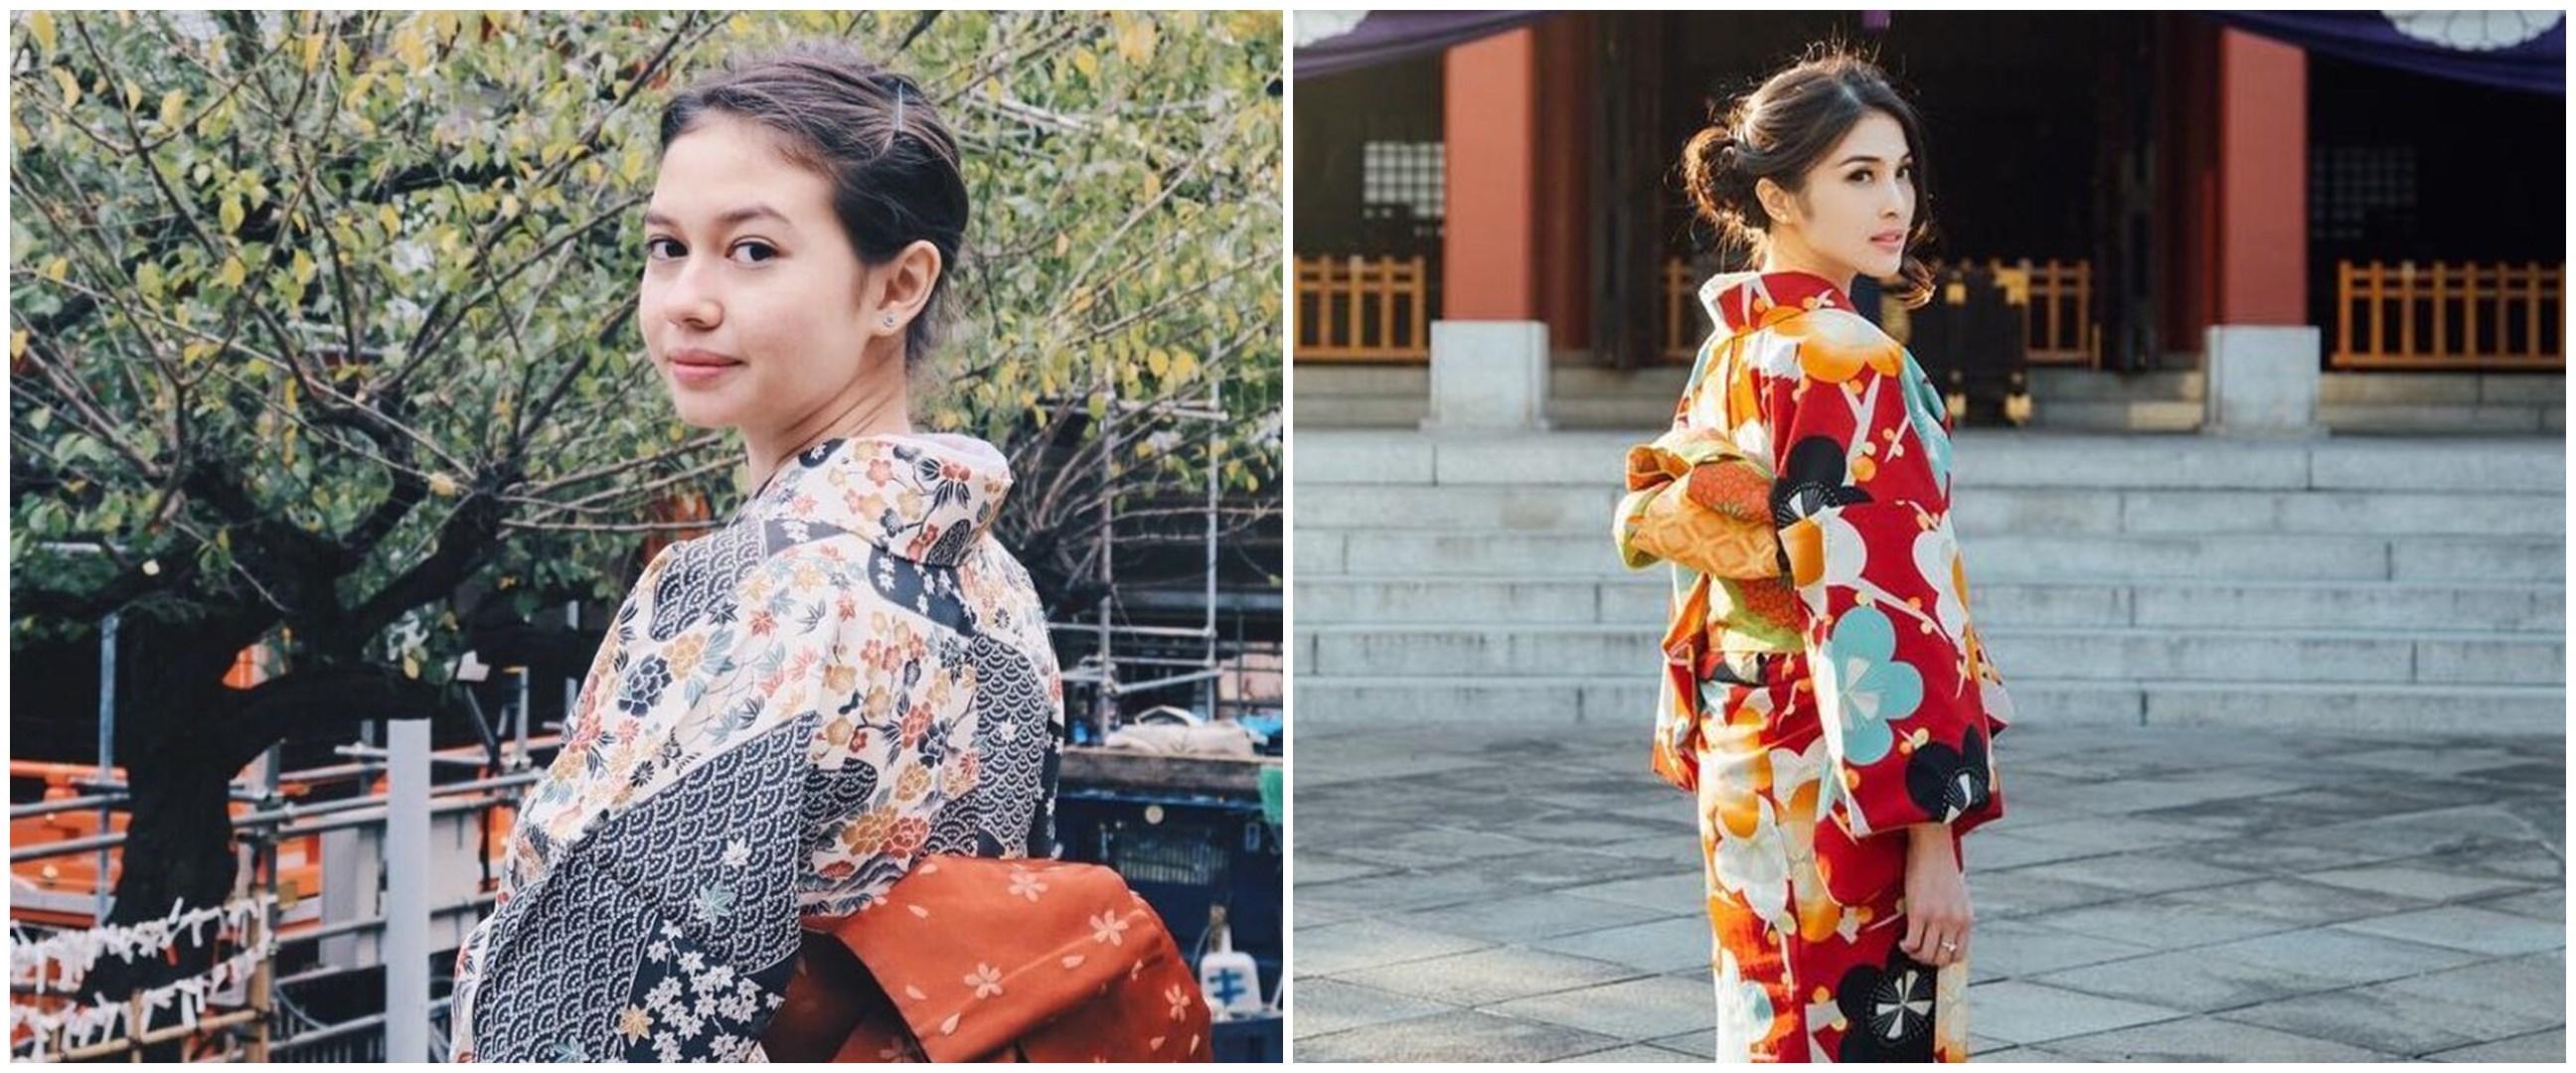 Potret 12 seleb cantik pakai kimono, pesonanya terpancar